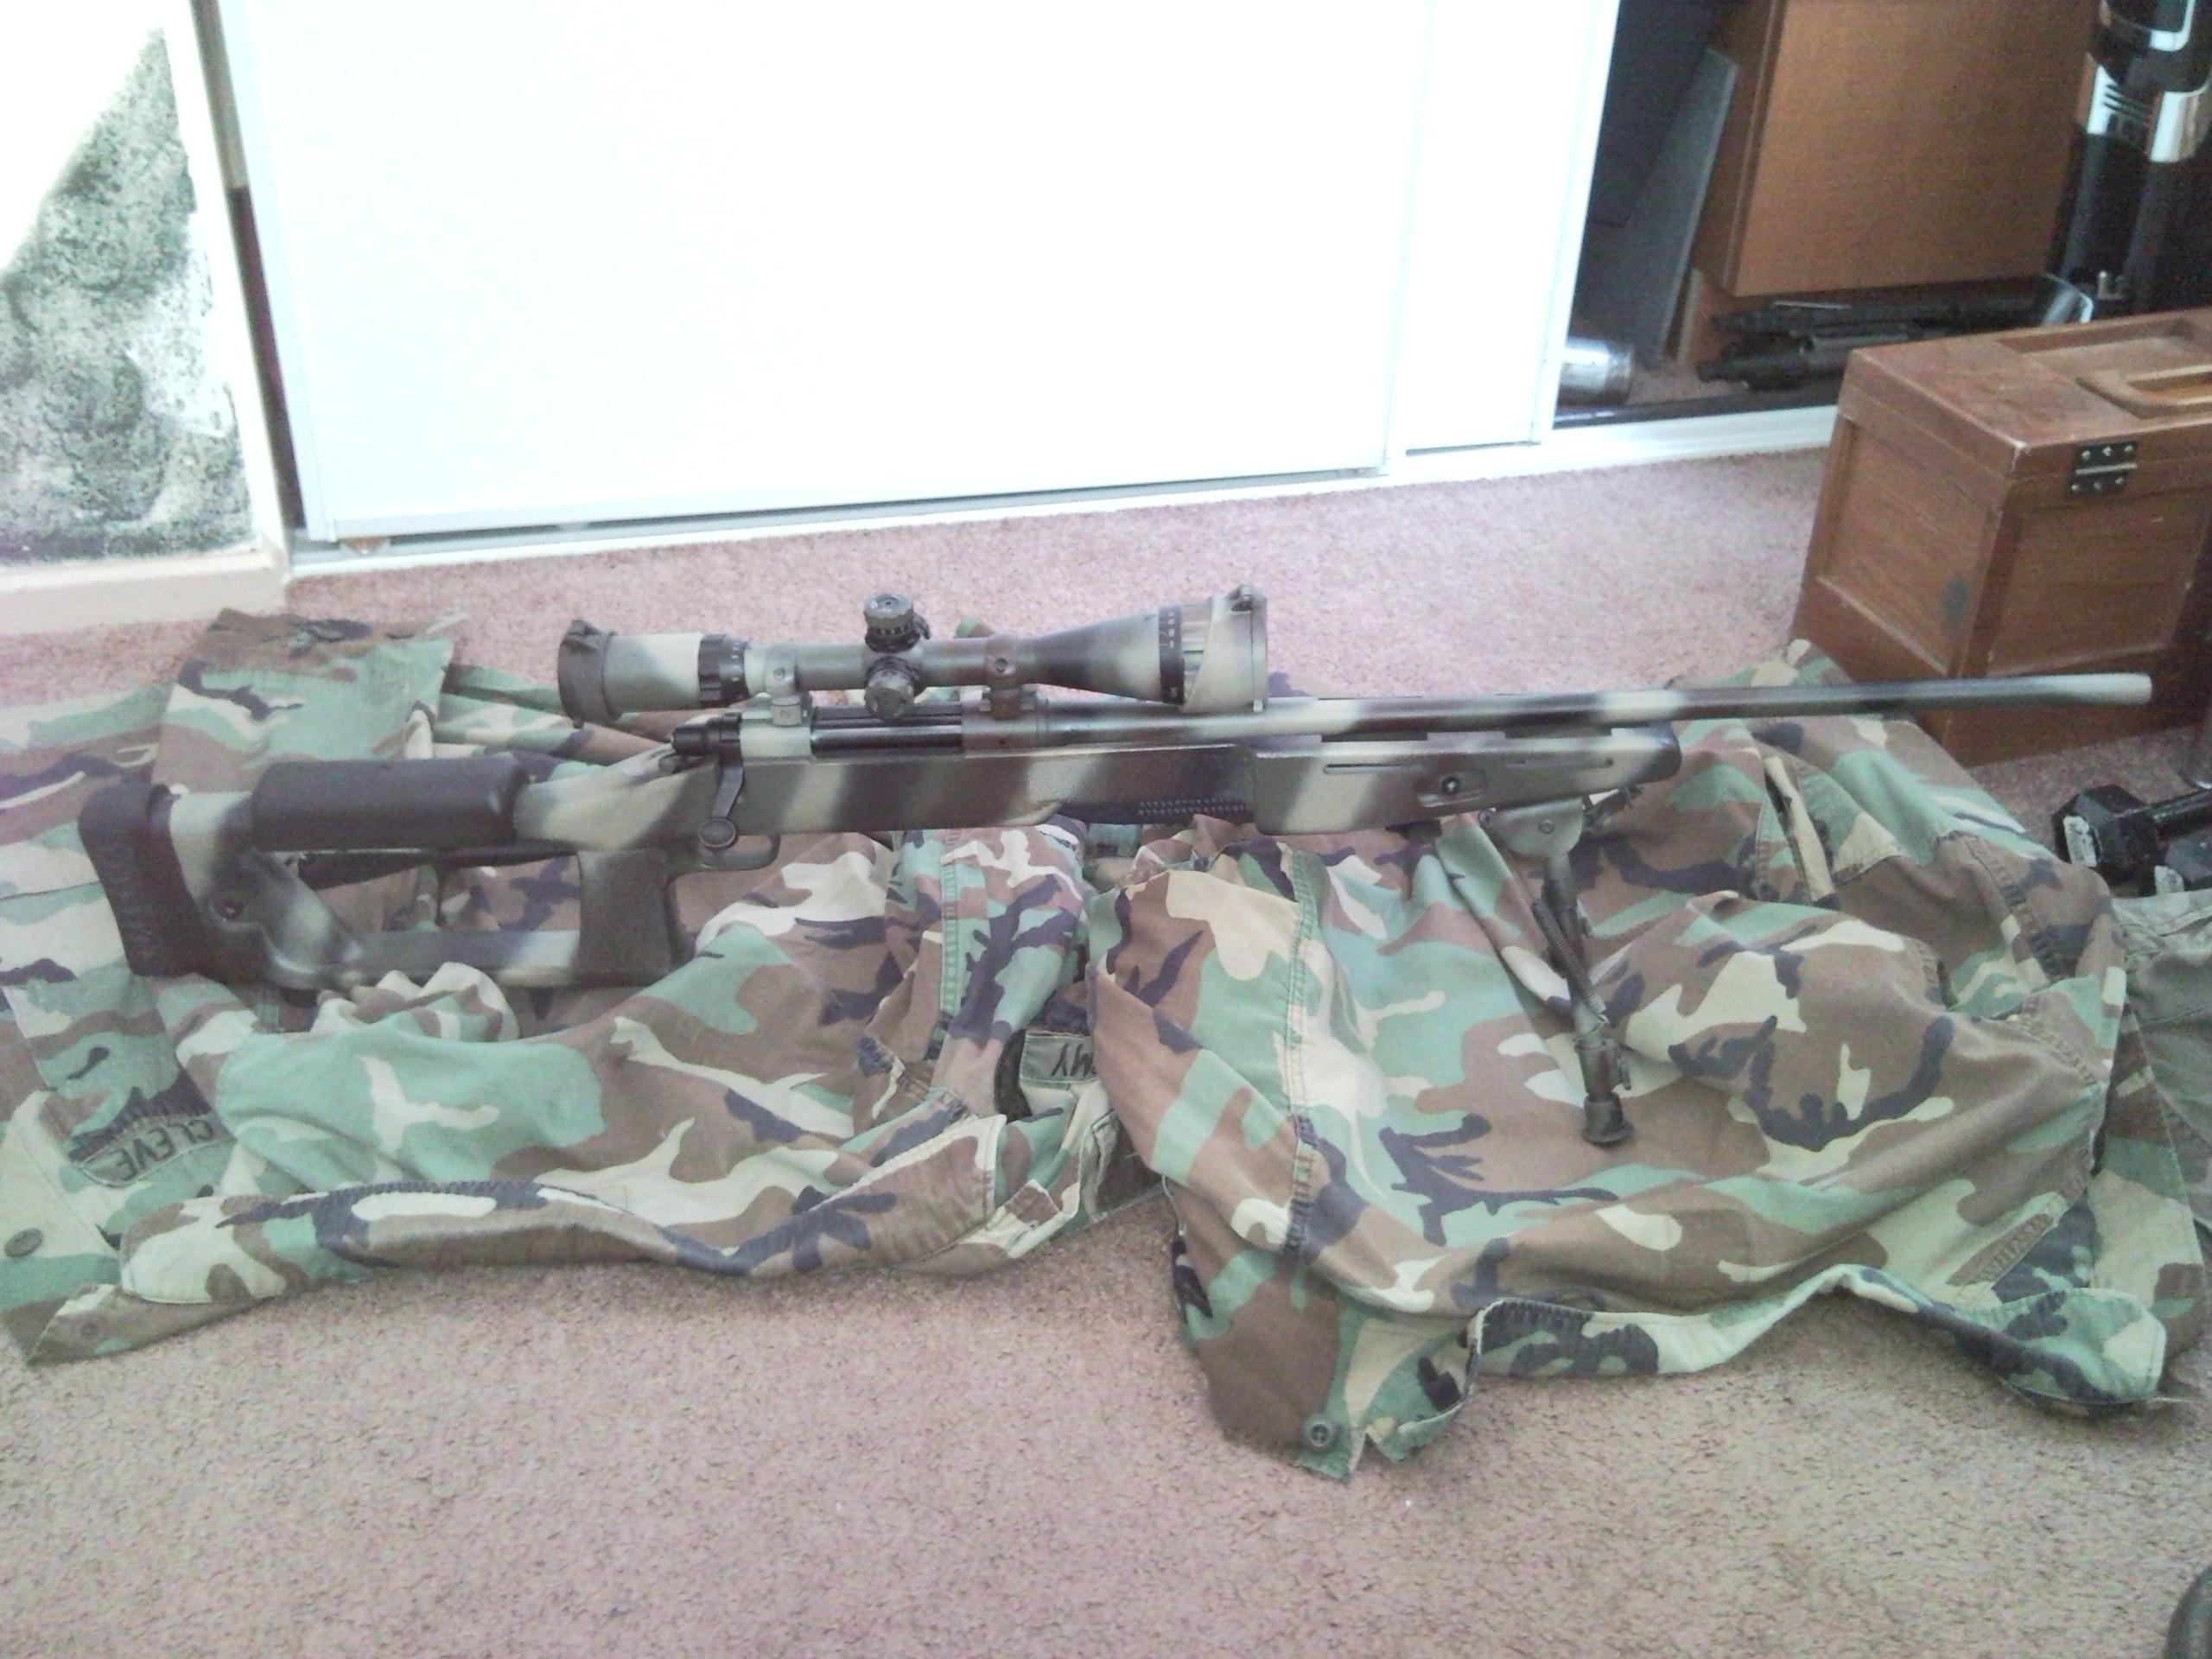 Choate Ultimate Sniper Review | Gun and Game - The Friendliest Gun